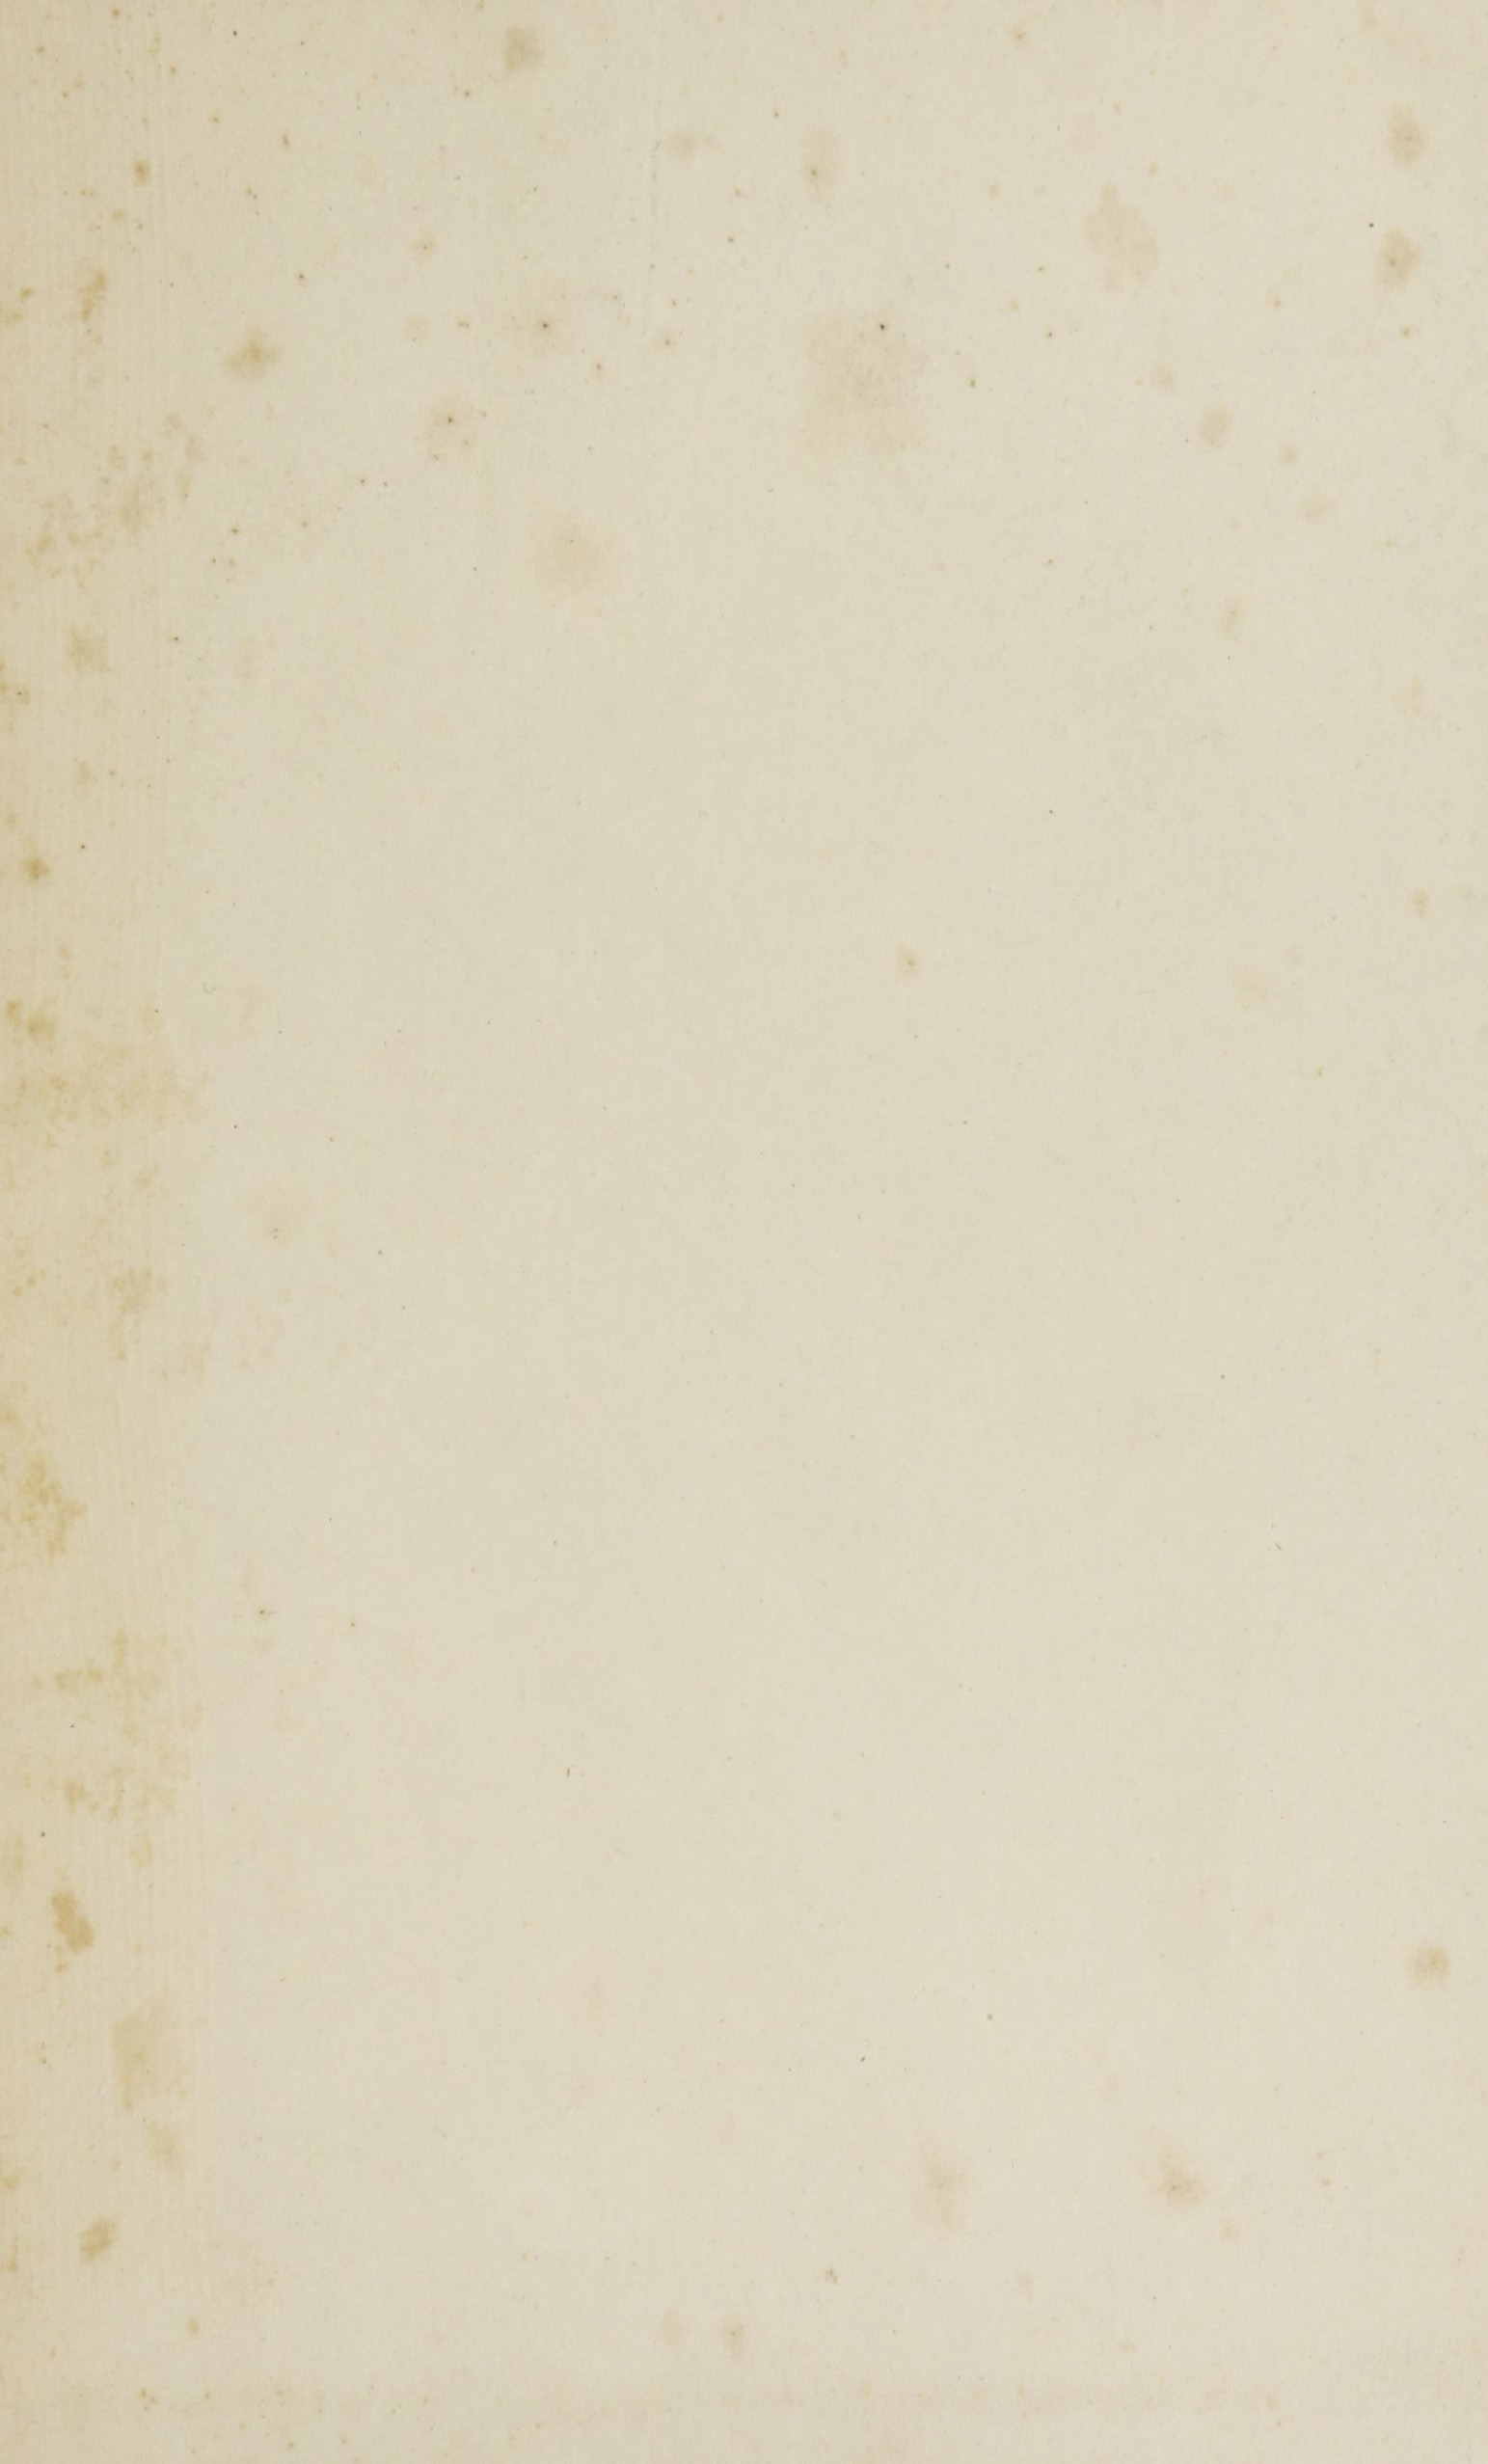 Charleston Yearbook, 1915, blank page